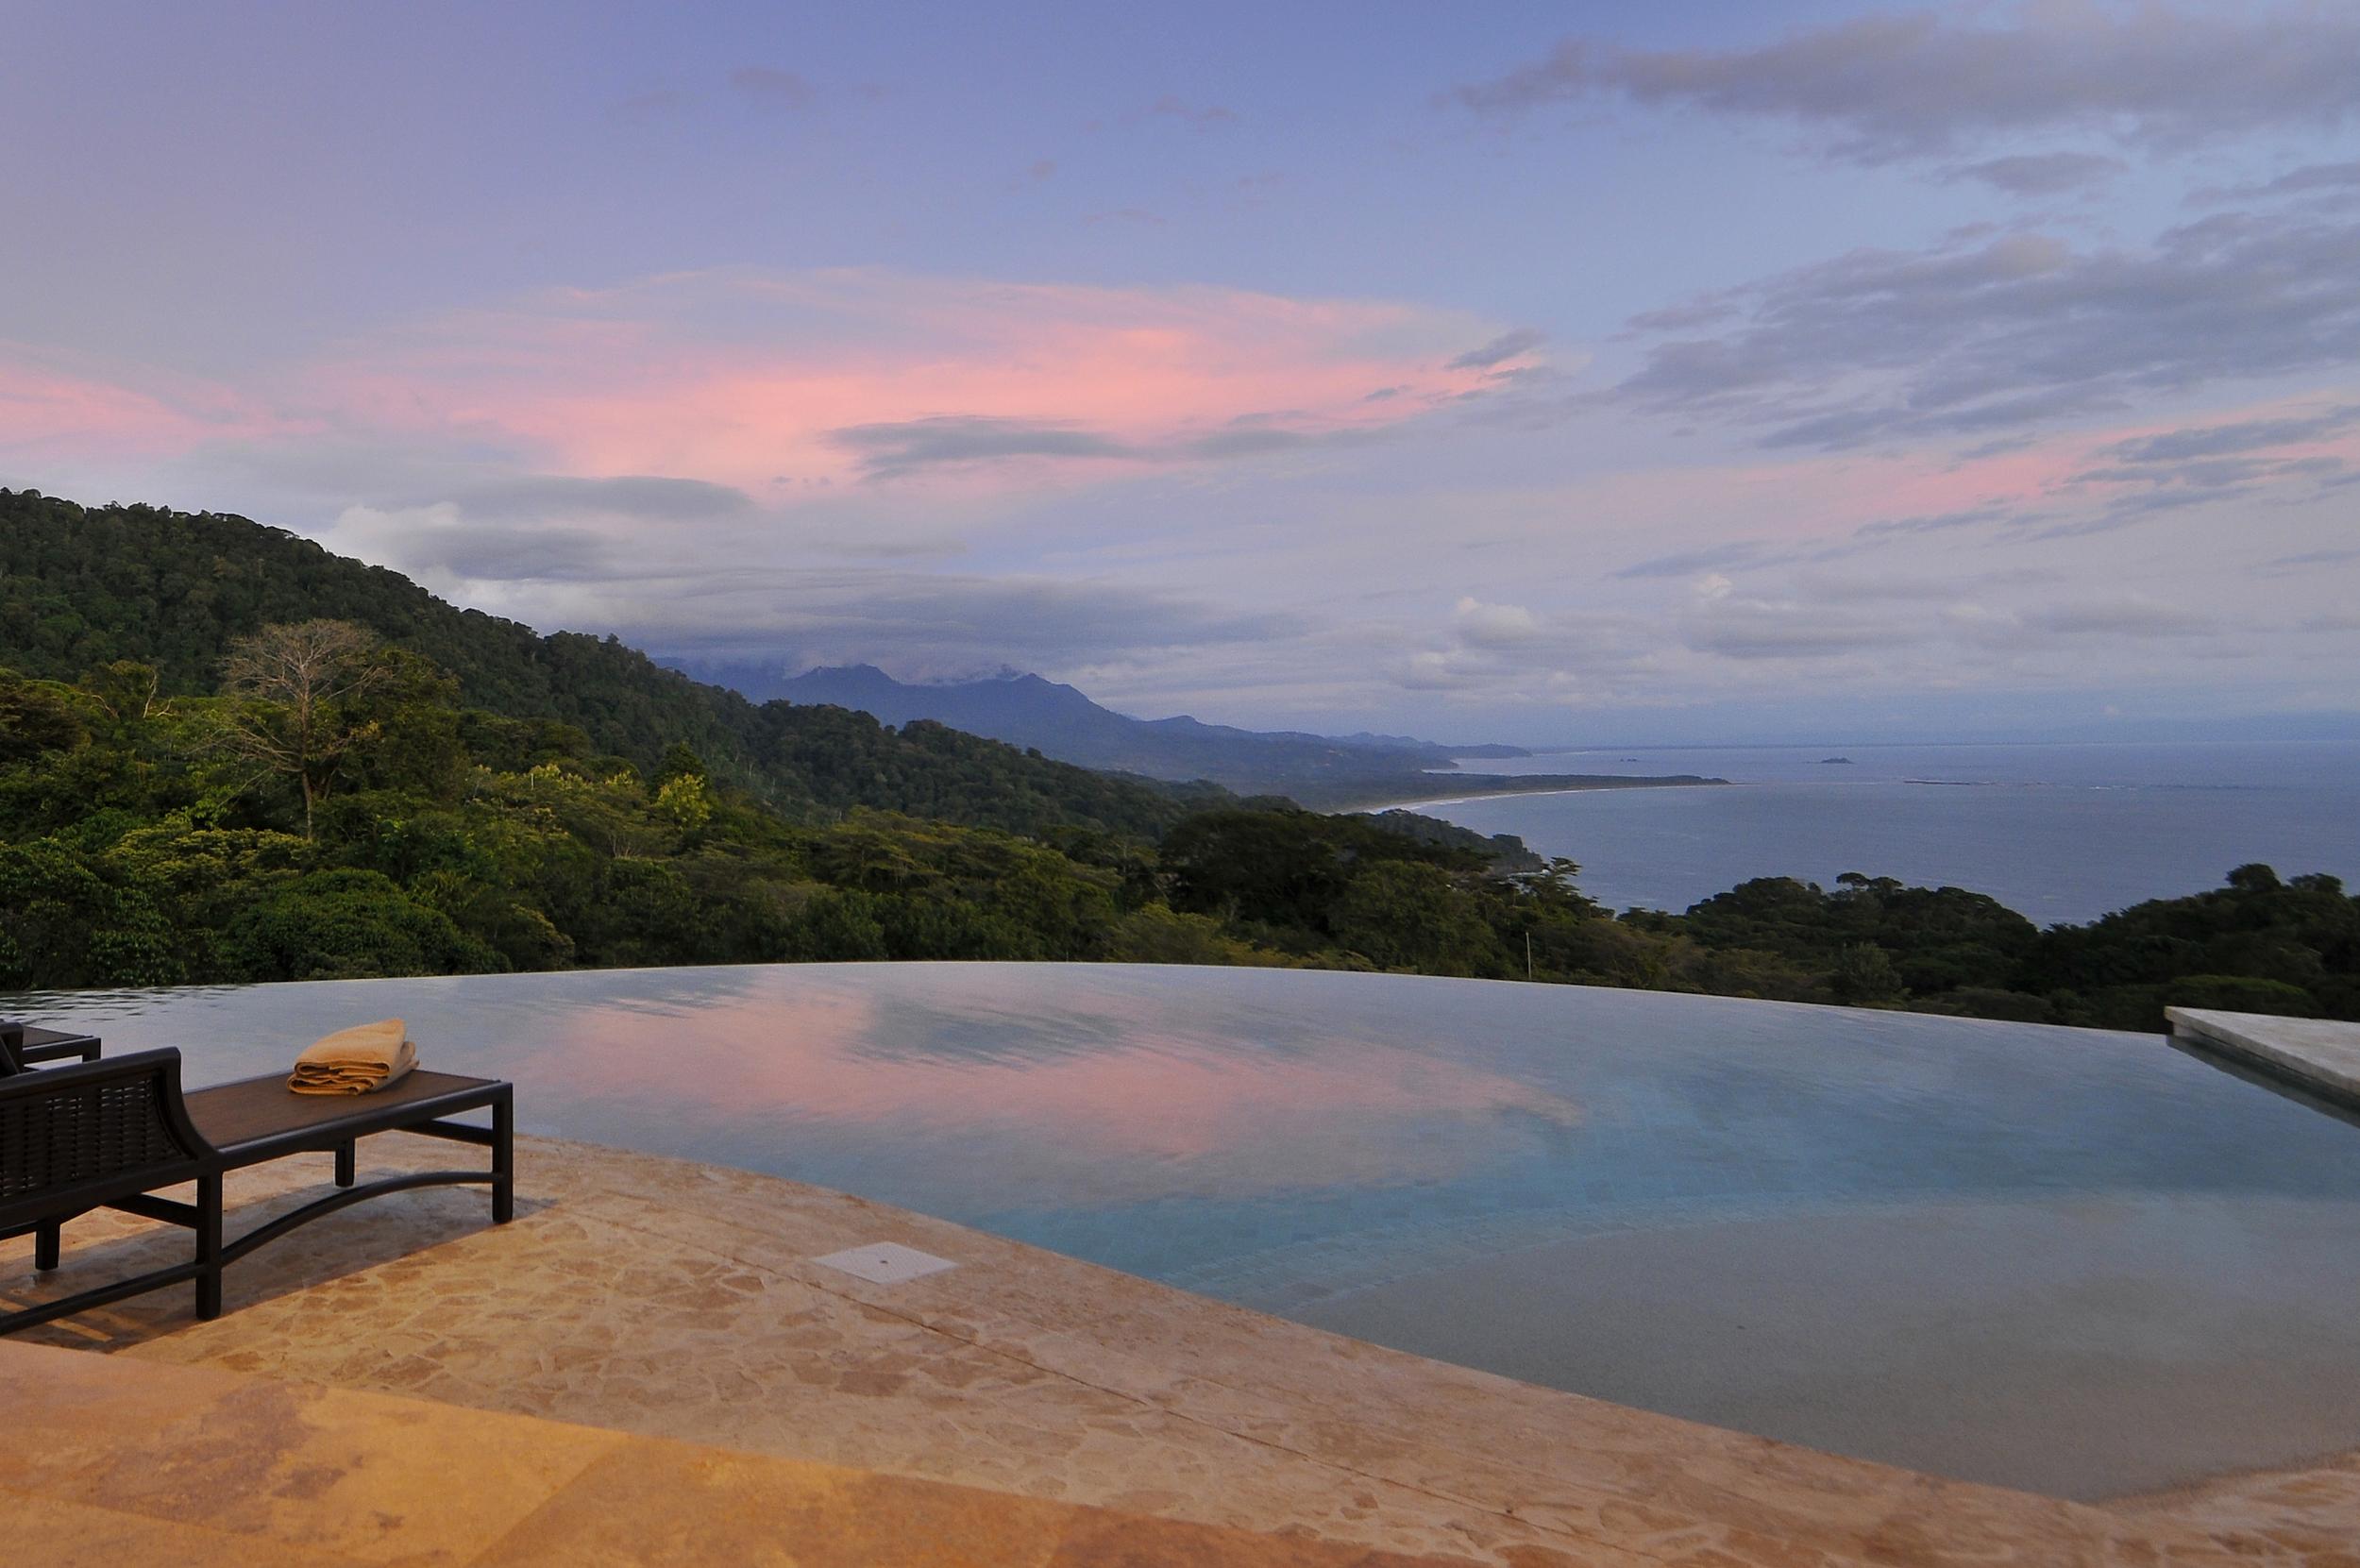 flex5-yoga-retreat-costa-rica-villa-infinity-pool-ocean-view-sunset.jpg